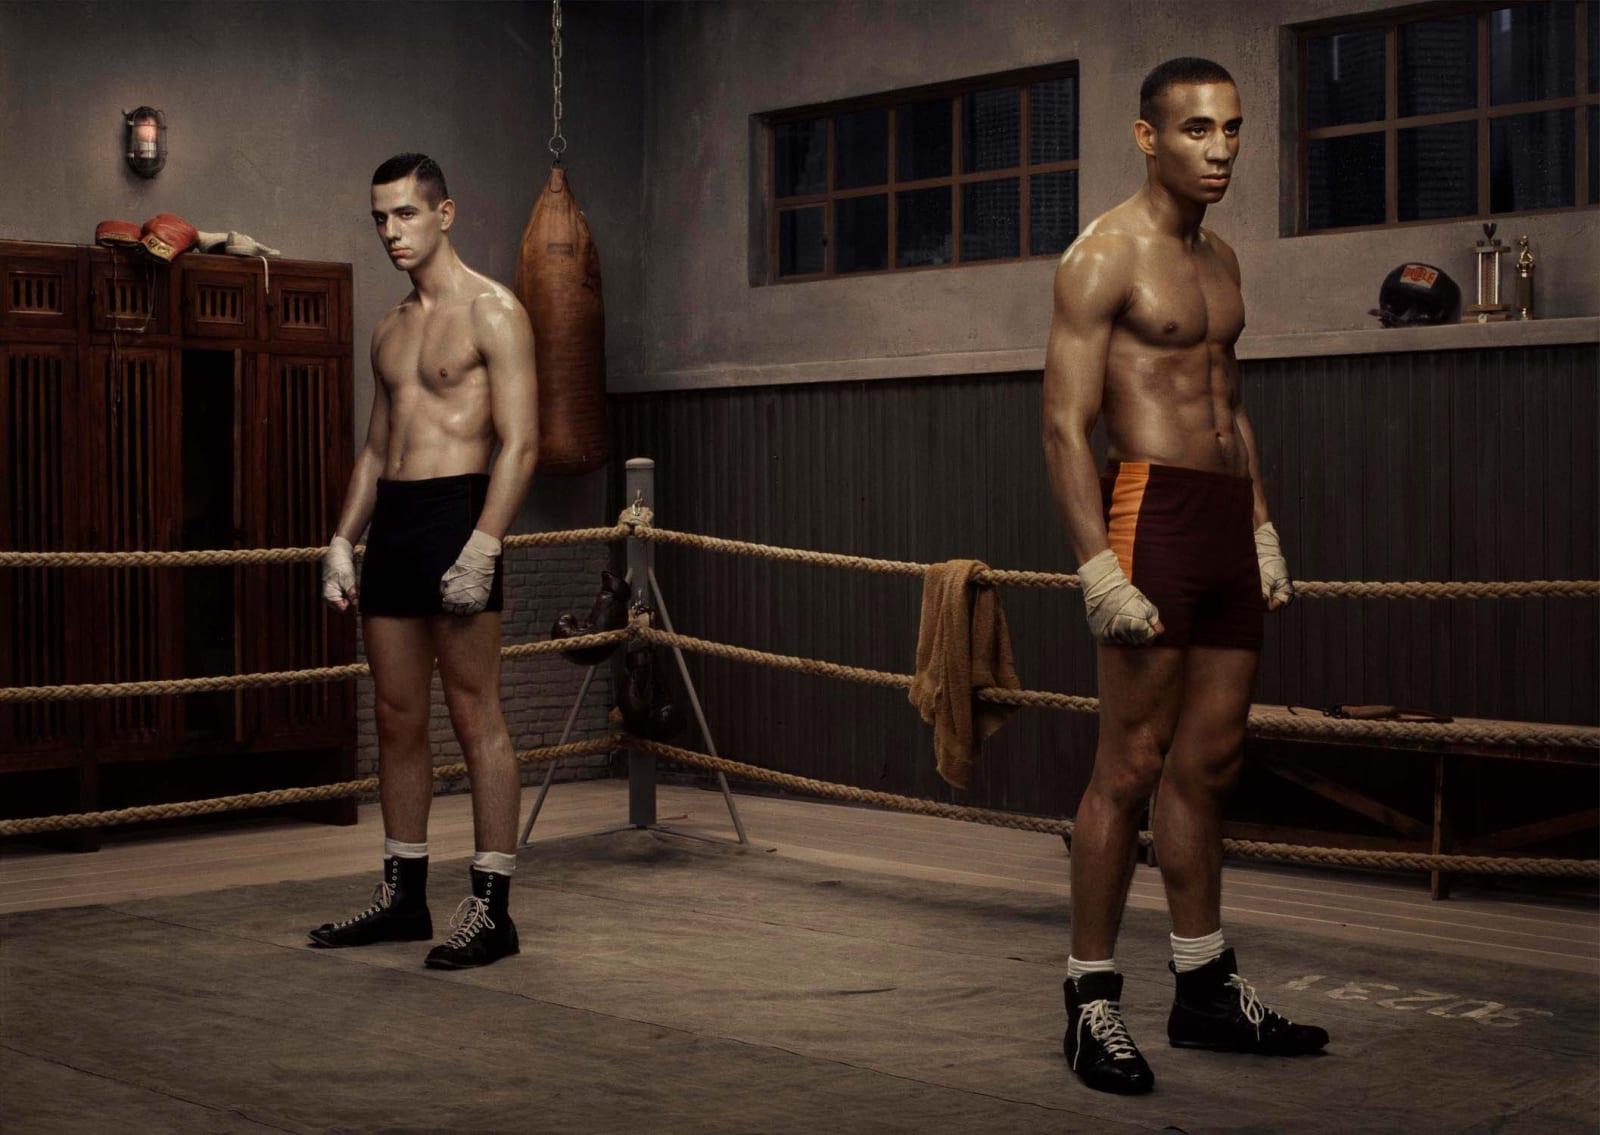 Erwin Olaf, The Boxing School, 2005